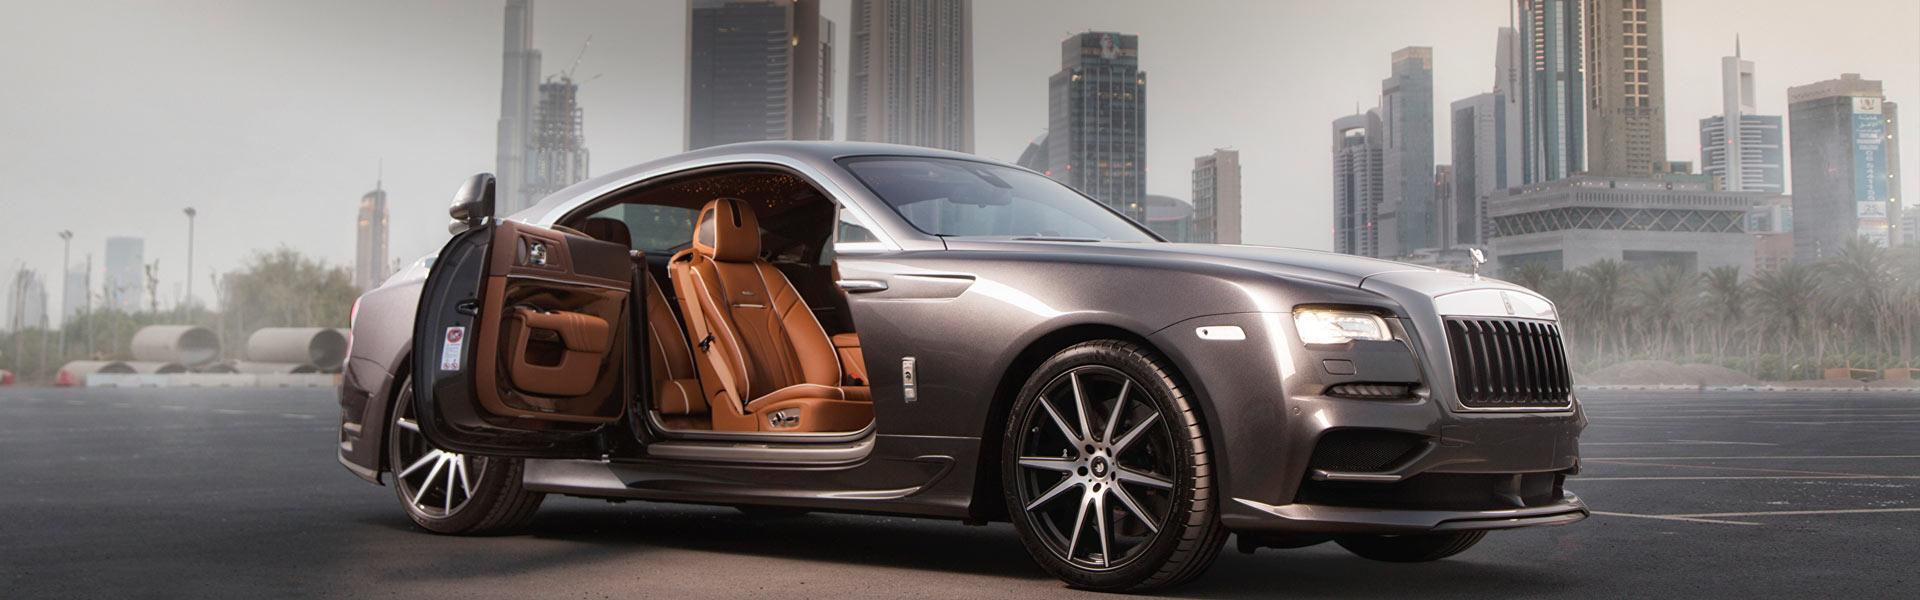 Замена жидкости вариатора Rolls-Royce